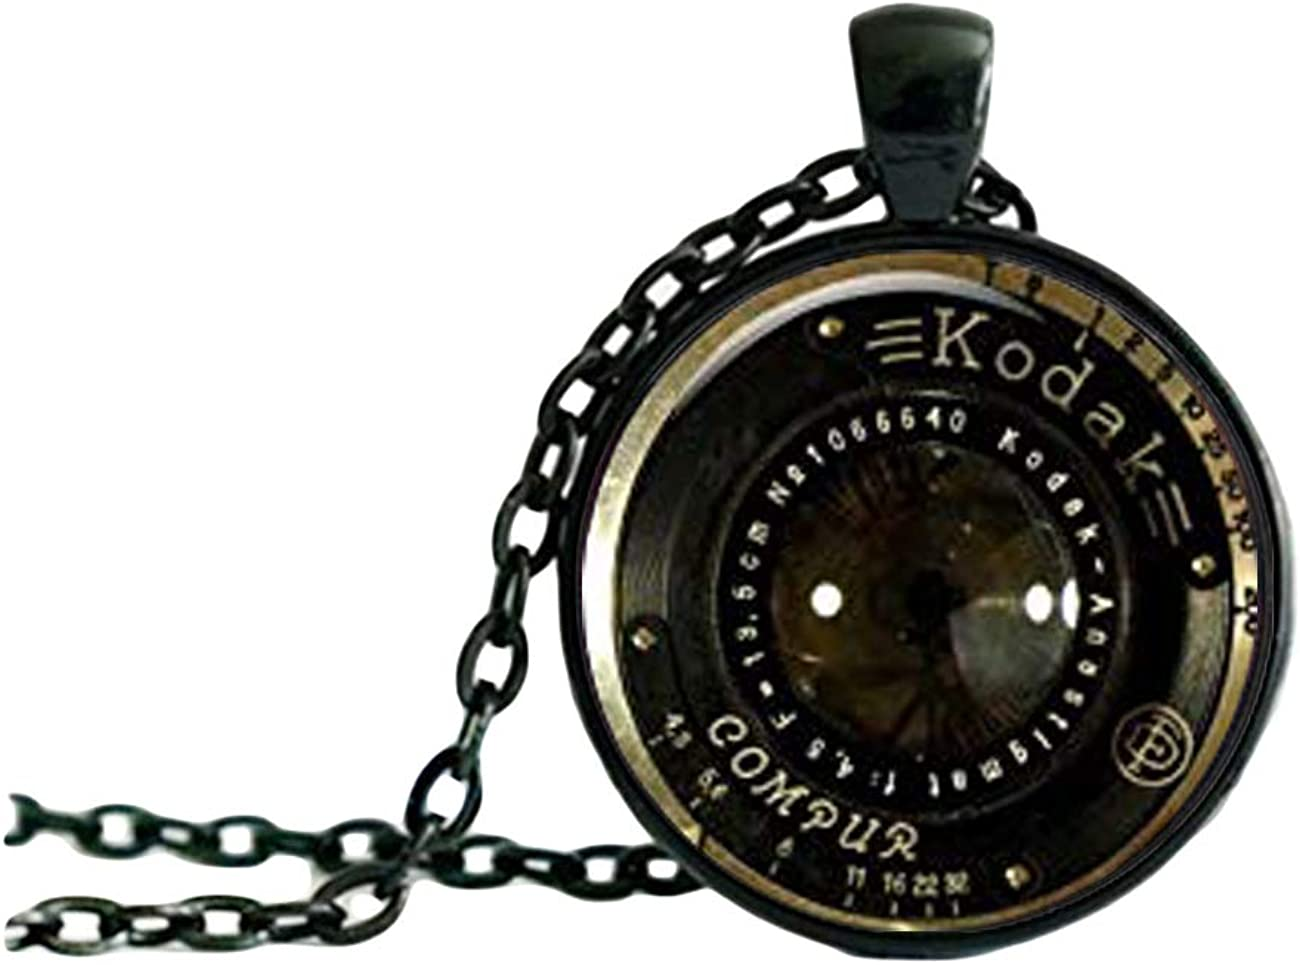 Vintage Camera Lens Charm Pendant Foto NECKLACE, Black Jewelery Charm Pendant